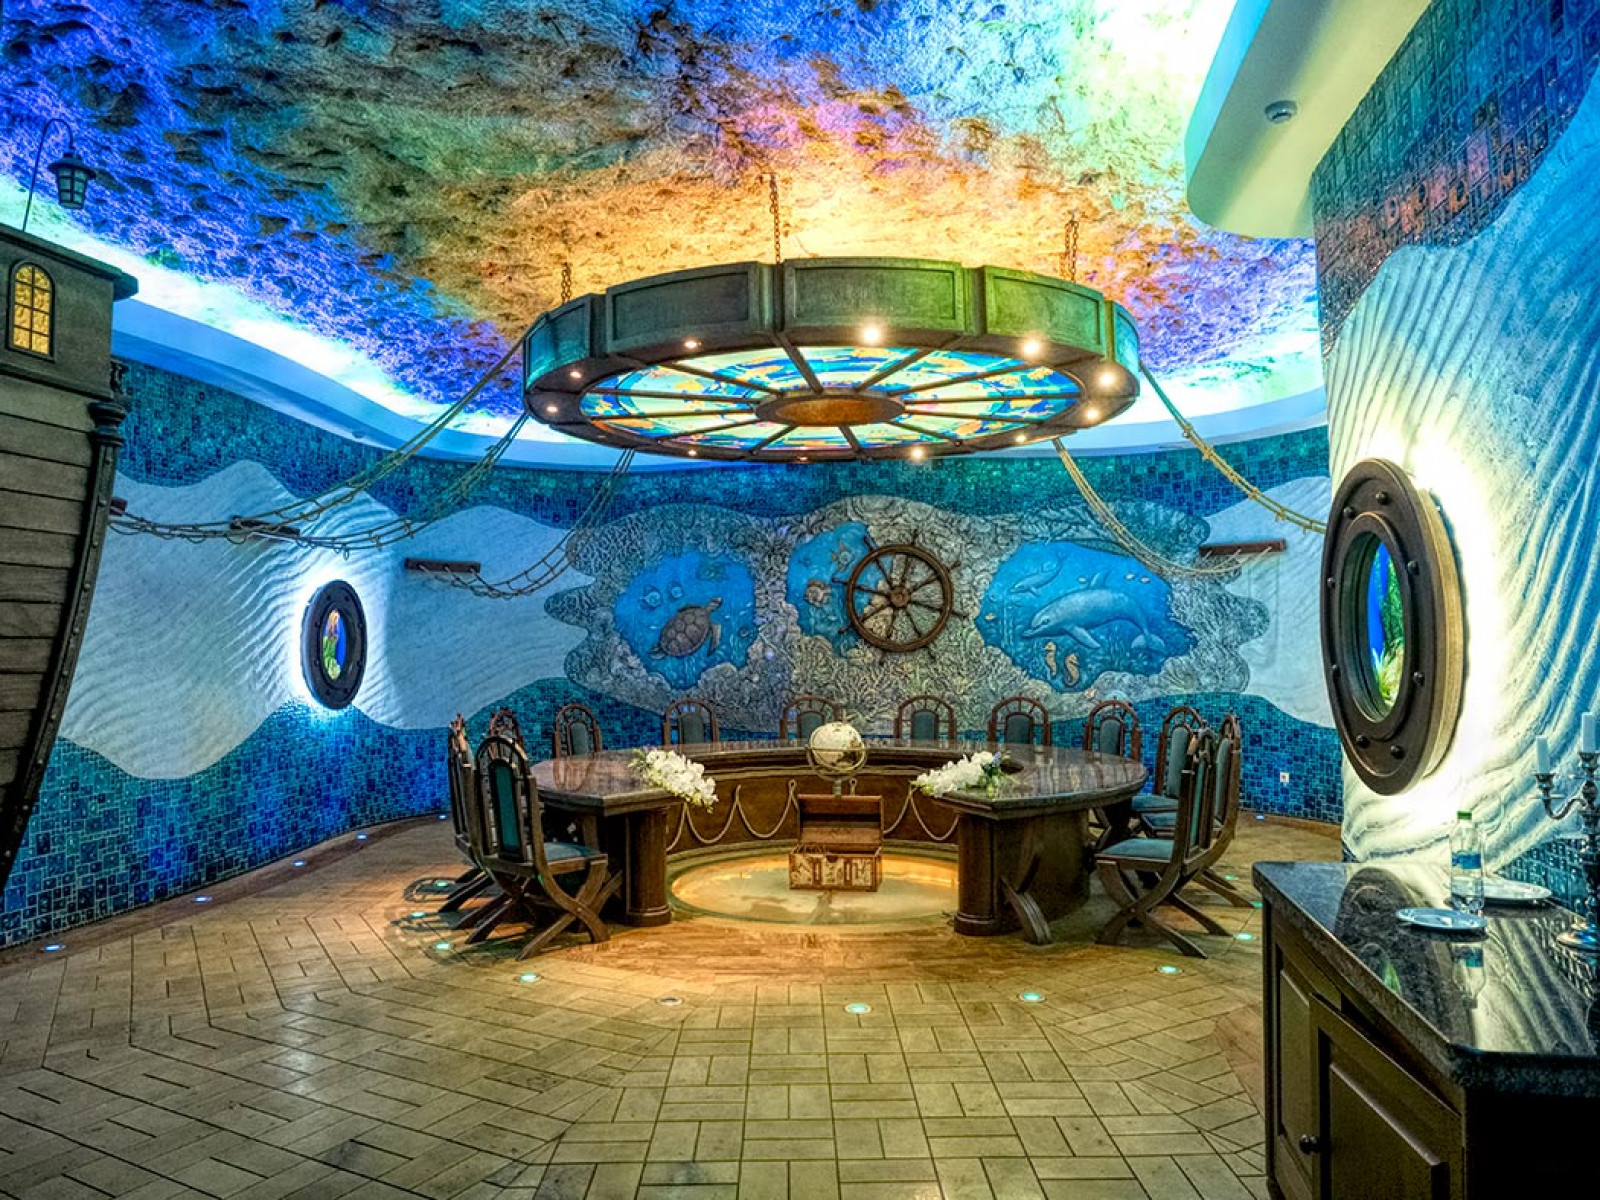 Degustation room